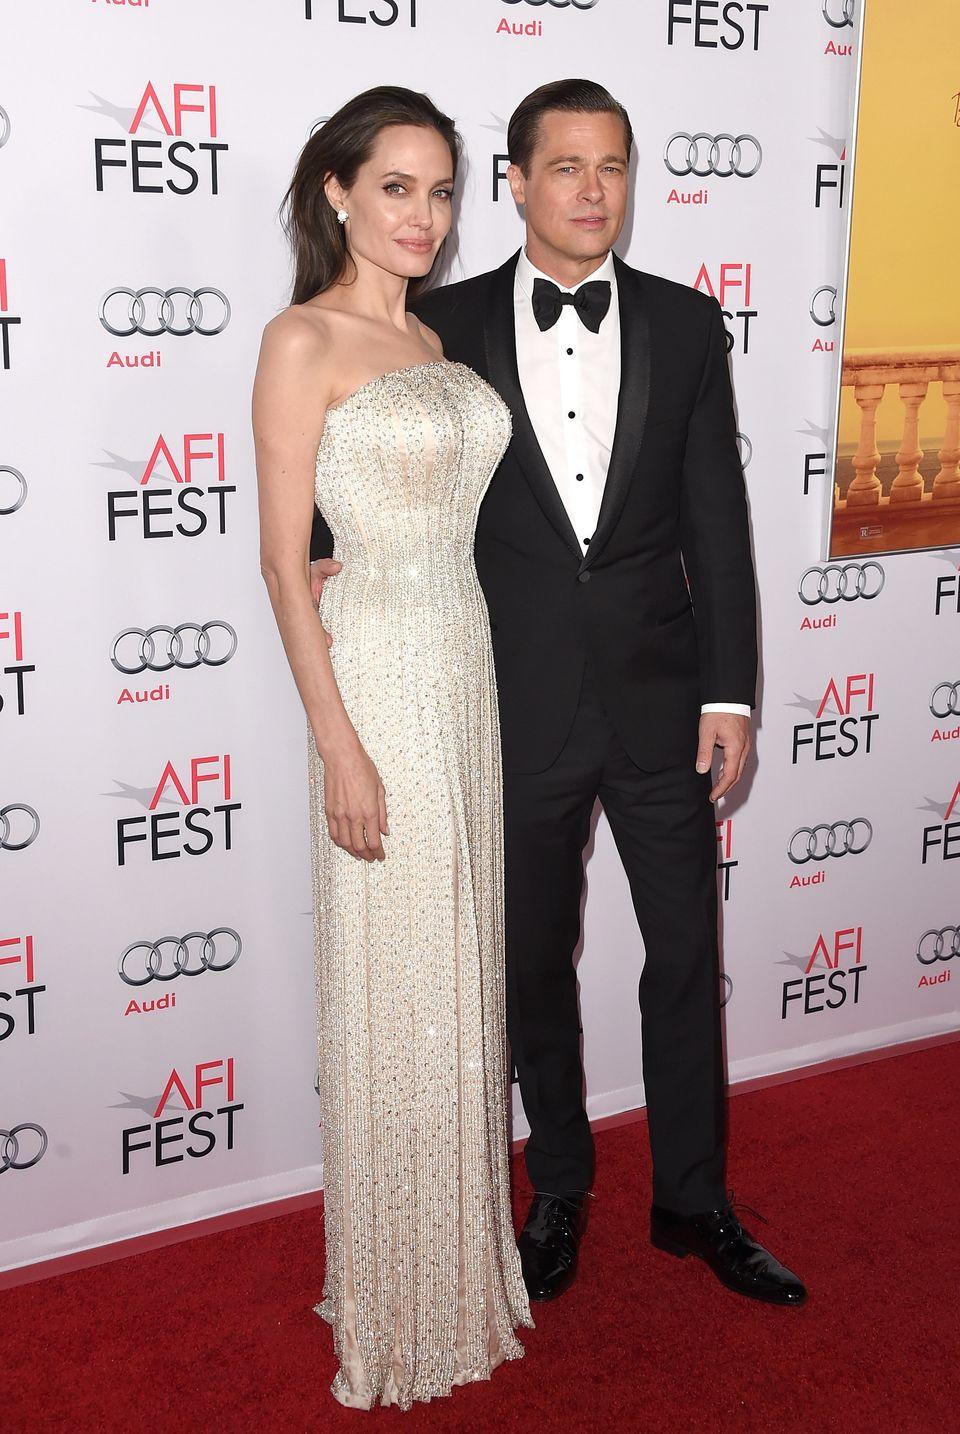 HOLLYWOOD, CA - NOVEMBER 05:  Writer-director-producer-actress Angelina Jolie Pitt (L) and actor-producer Brad Pitt attend th